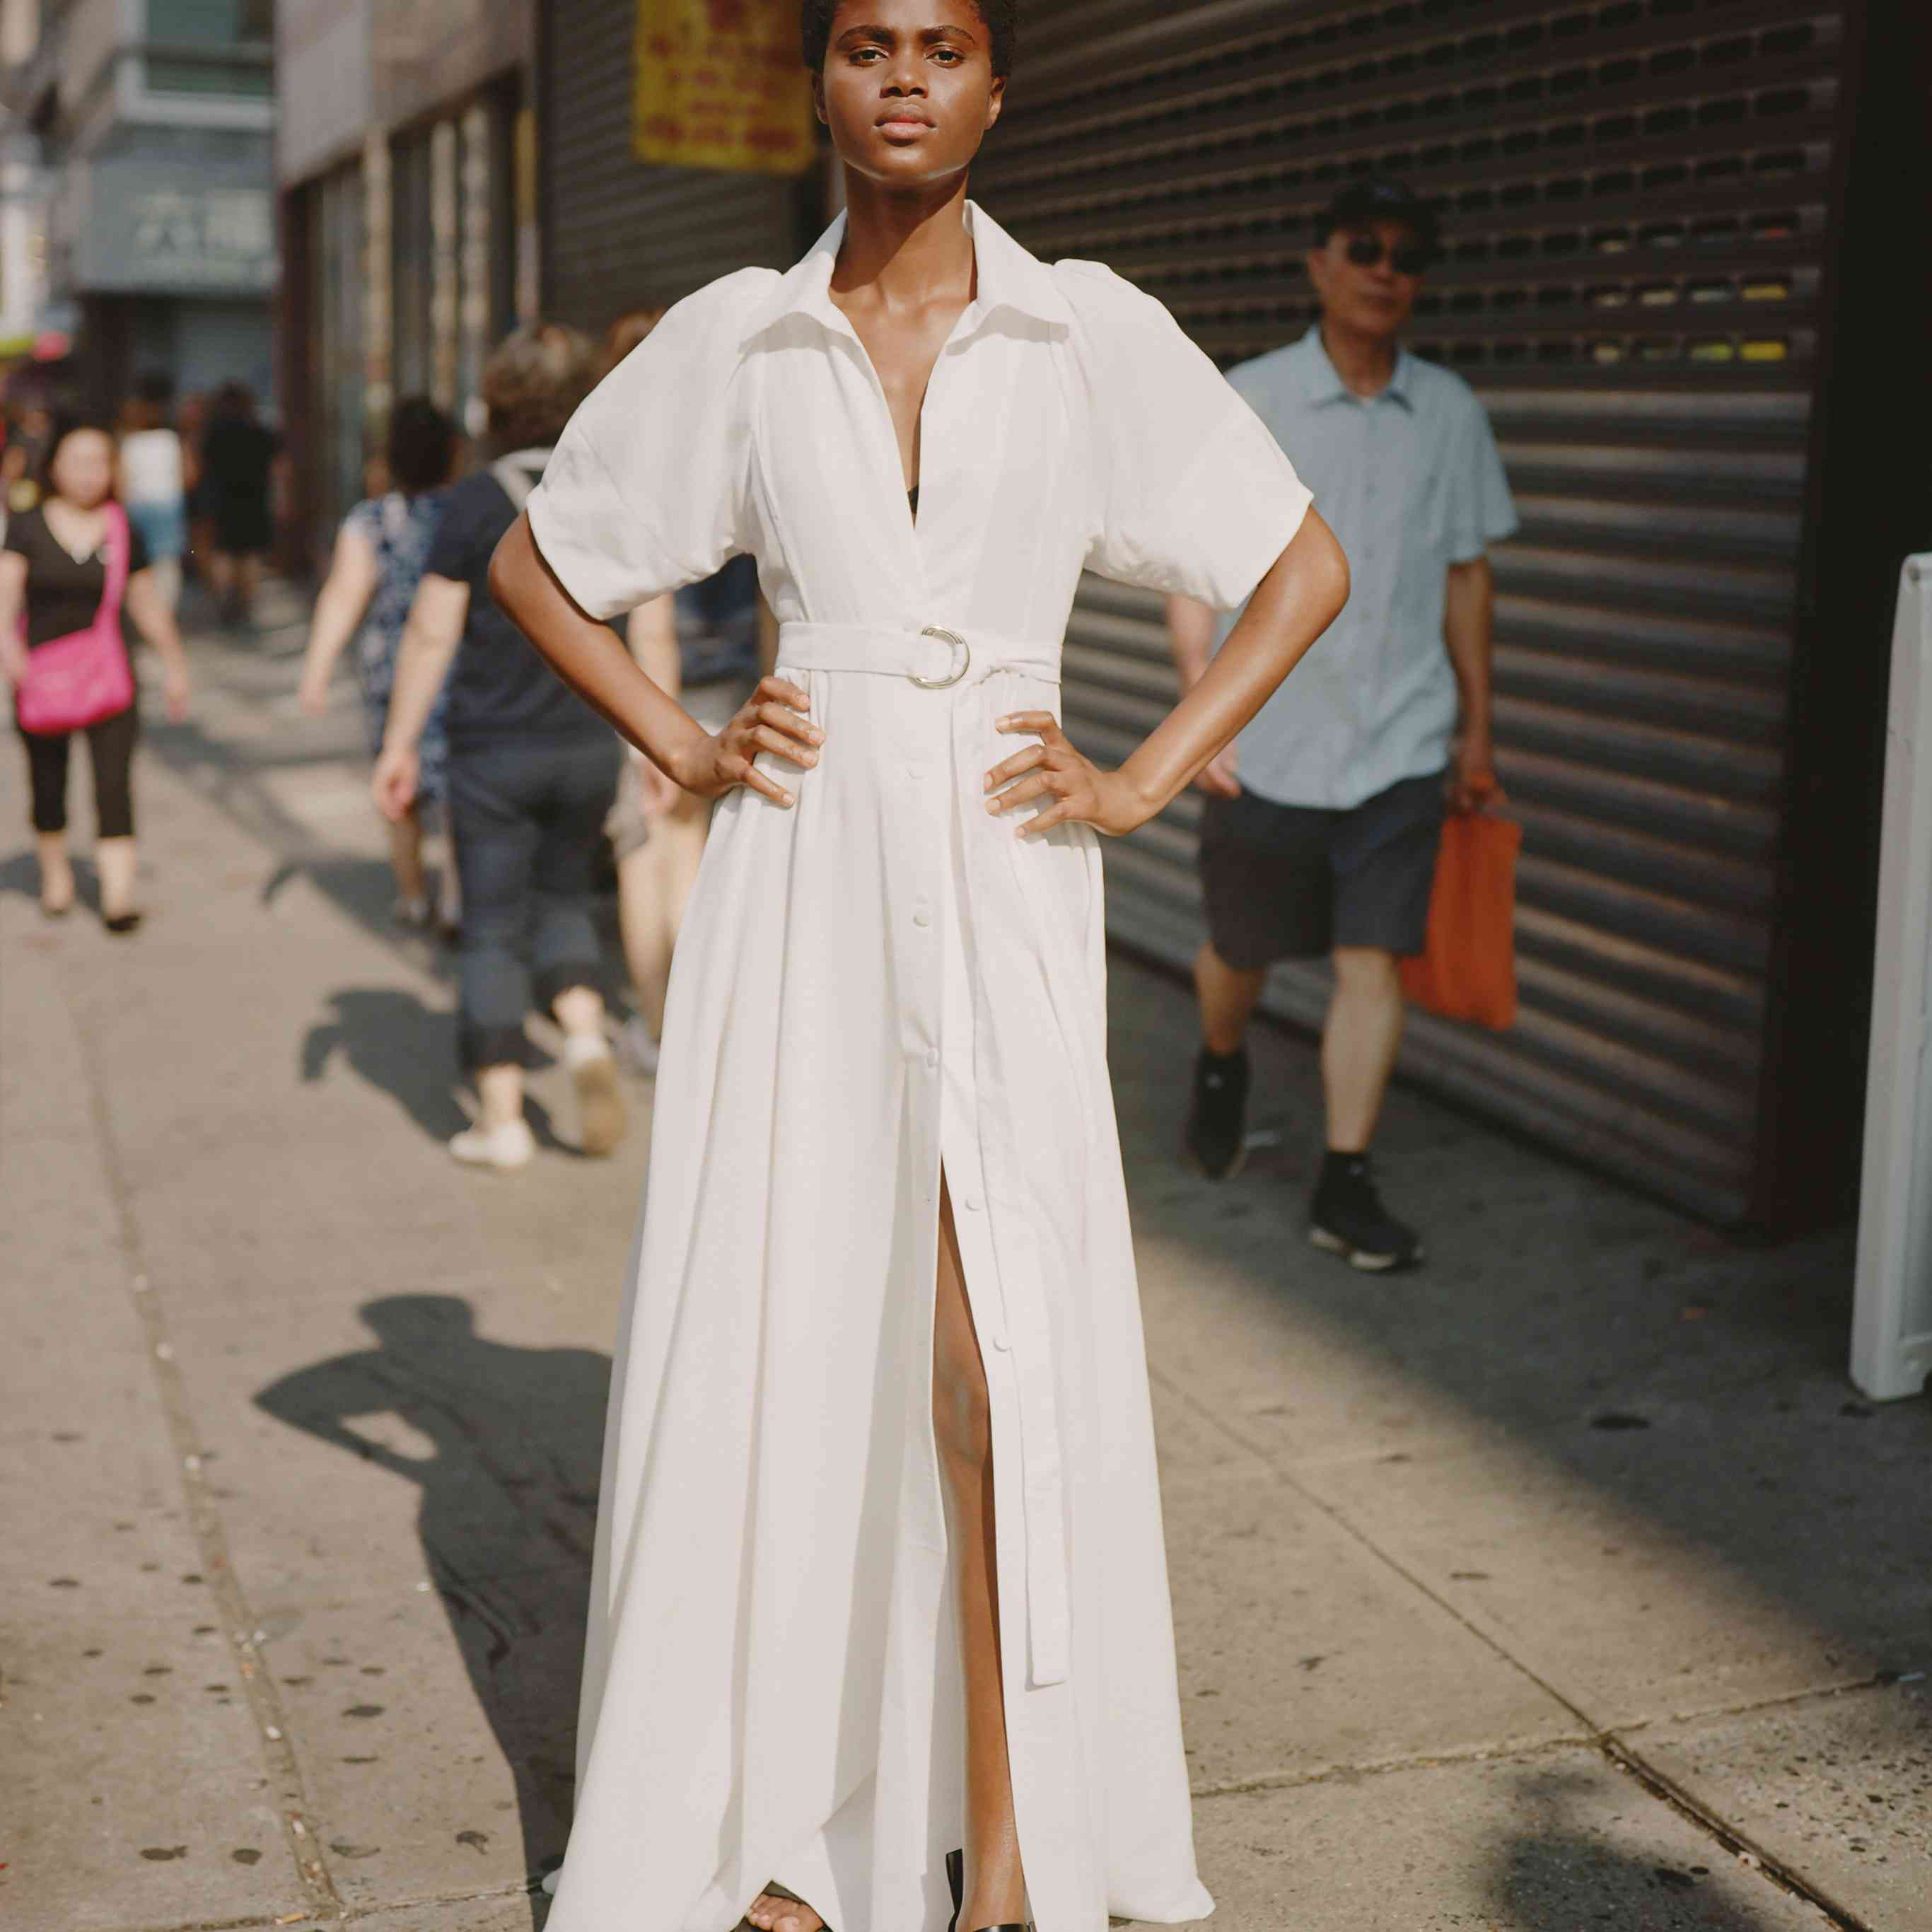 Model in collared midi wedding dress